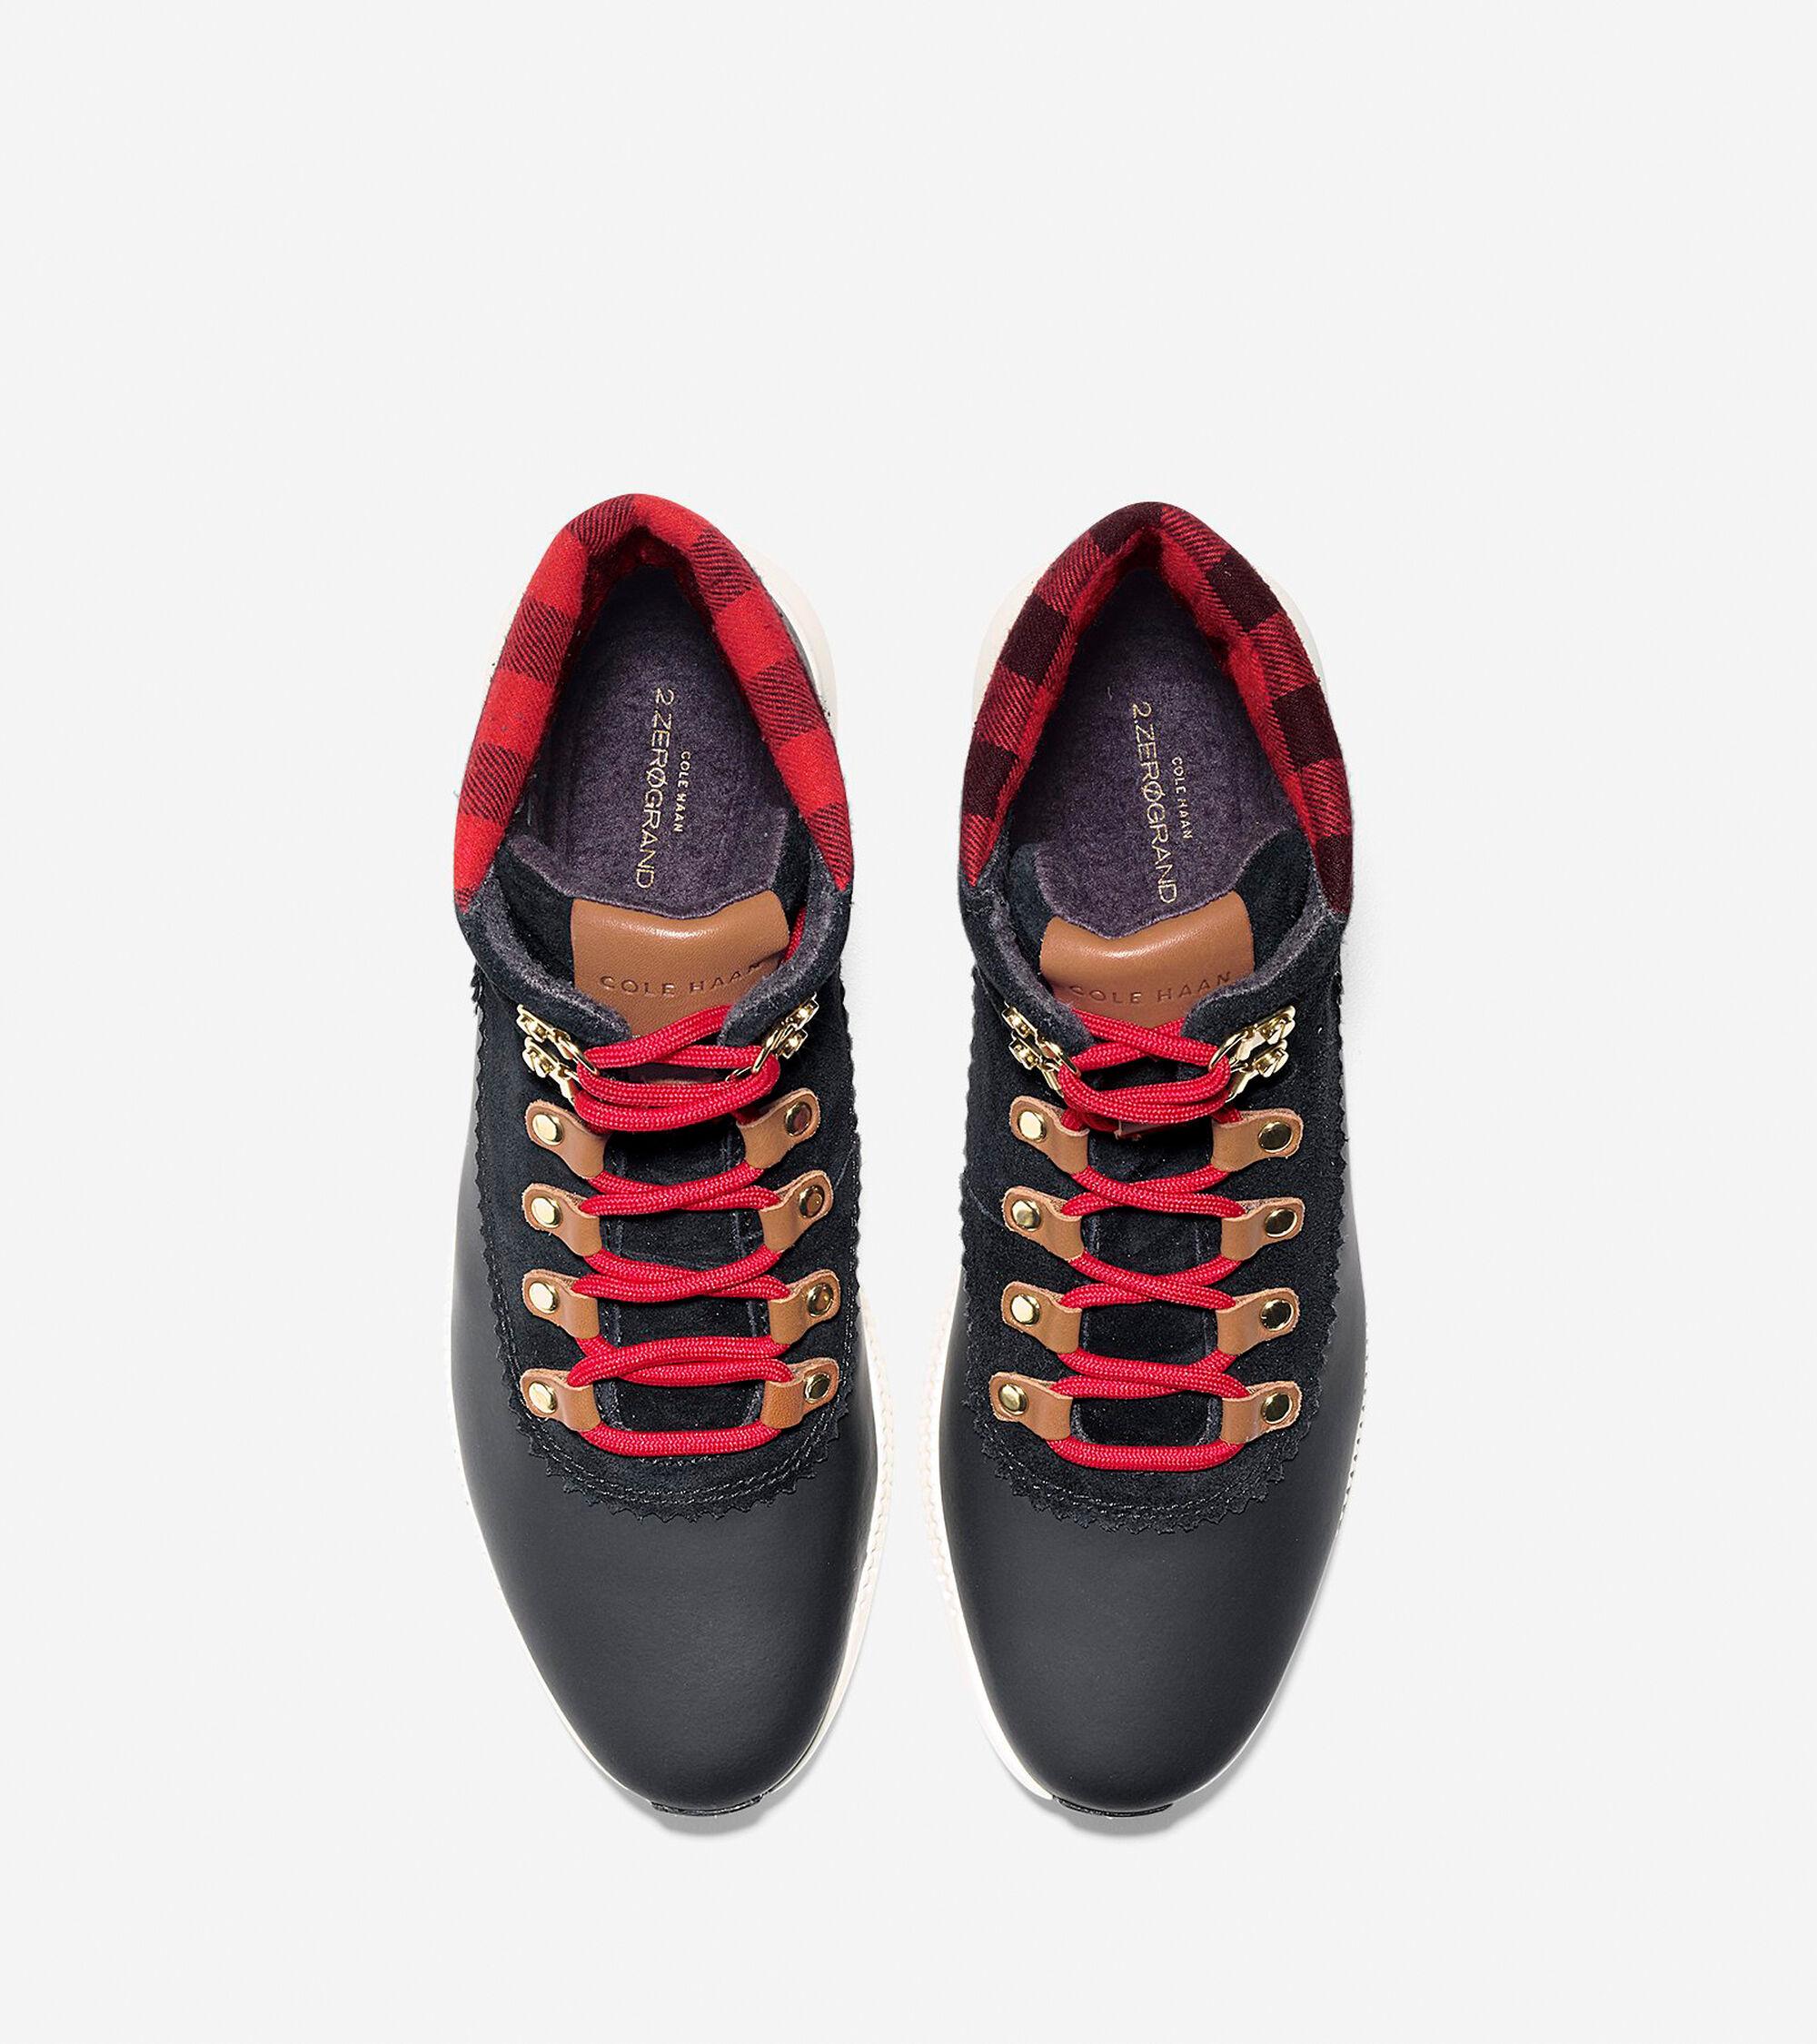 305468d8afa1d Women's 2.ZEROGRAND Waterproof Hiker Boots in Black-Buffalo Check ...